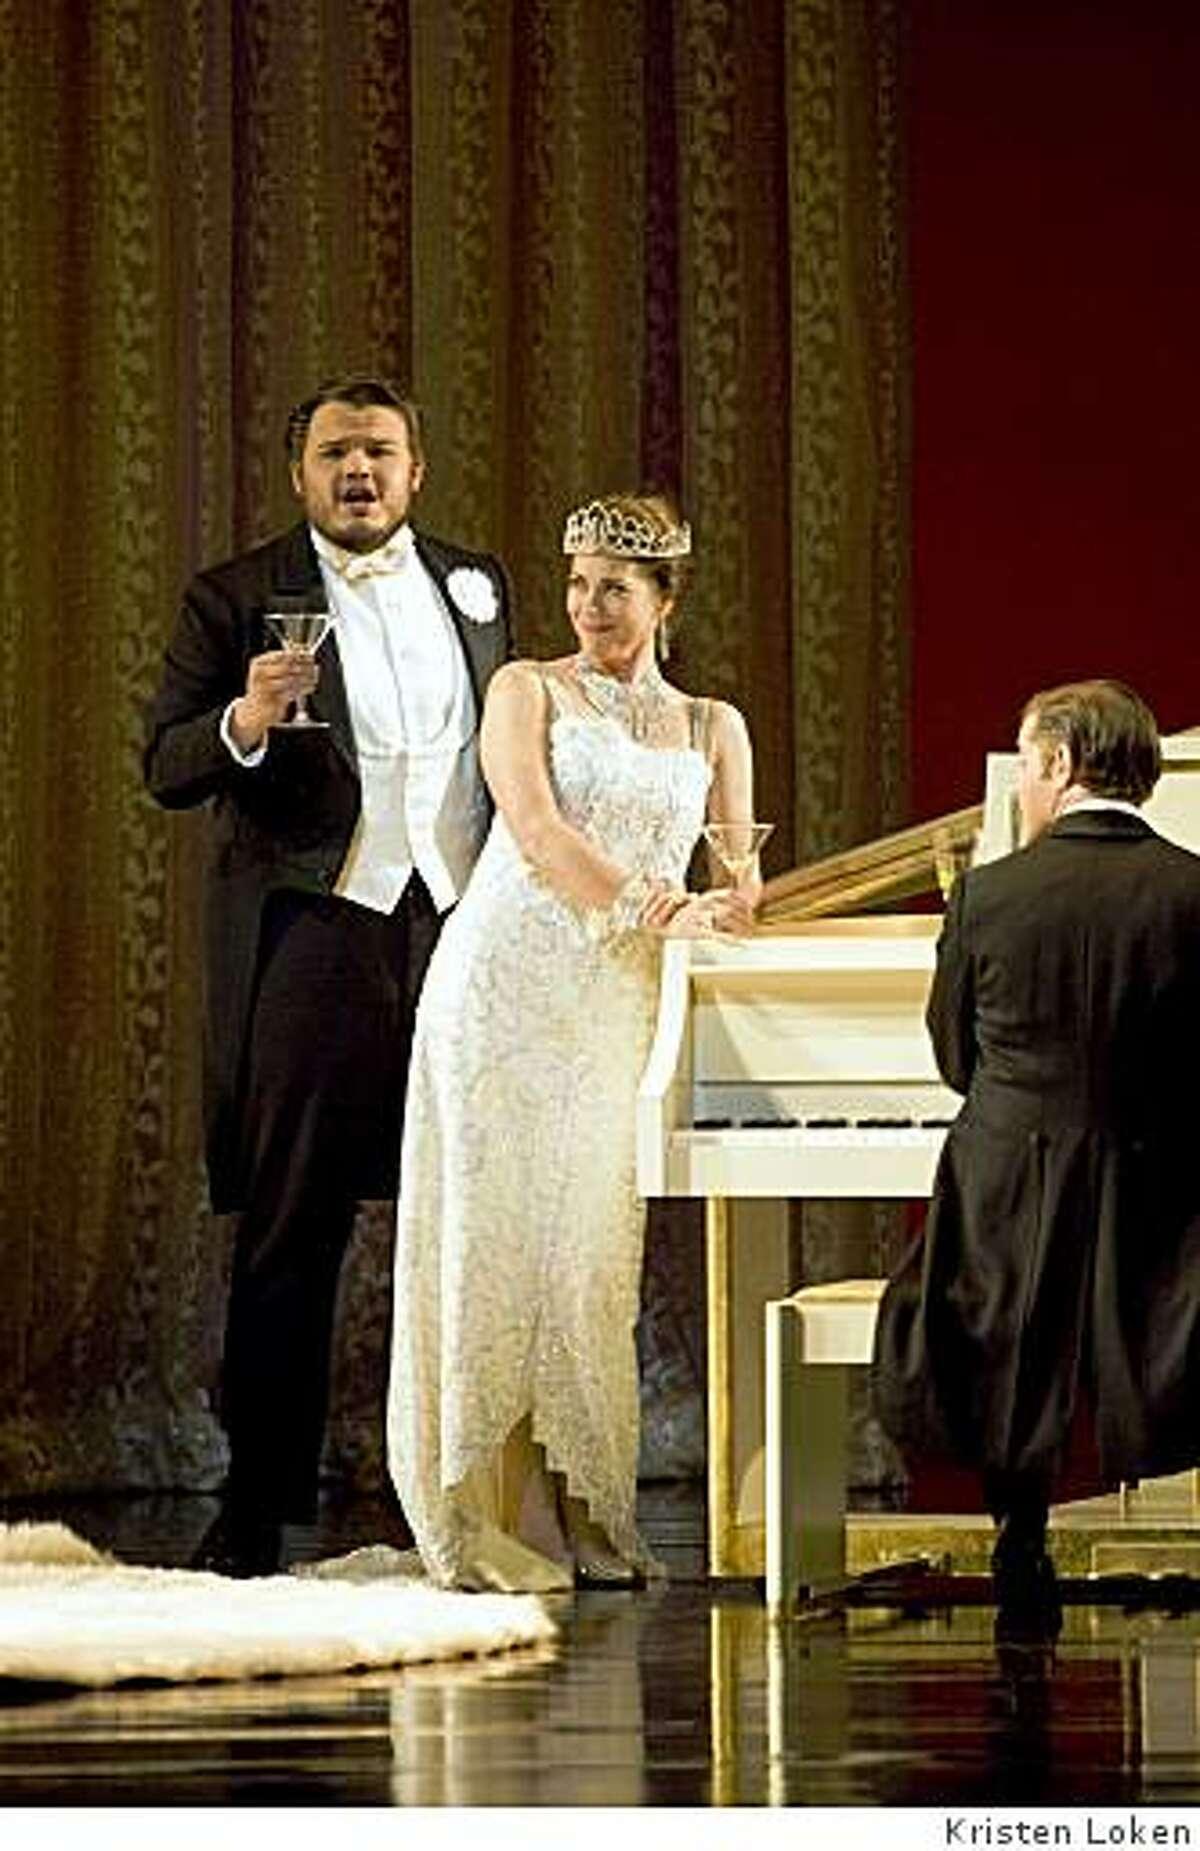 David Lomelí (l.) as Alfredo and Elizabeth Futral as Violetta in